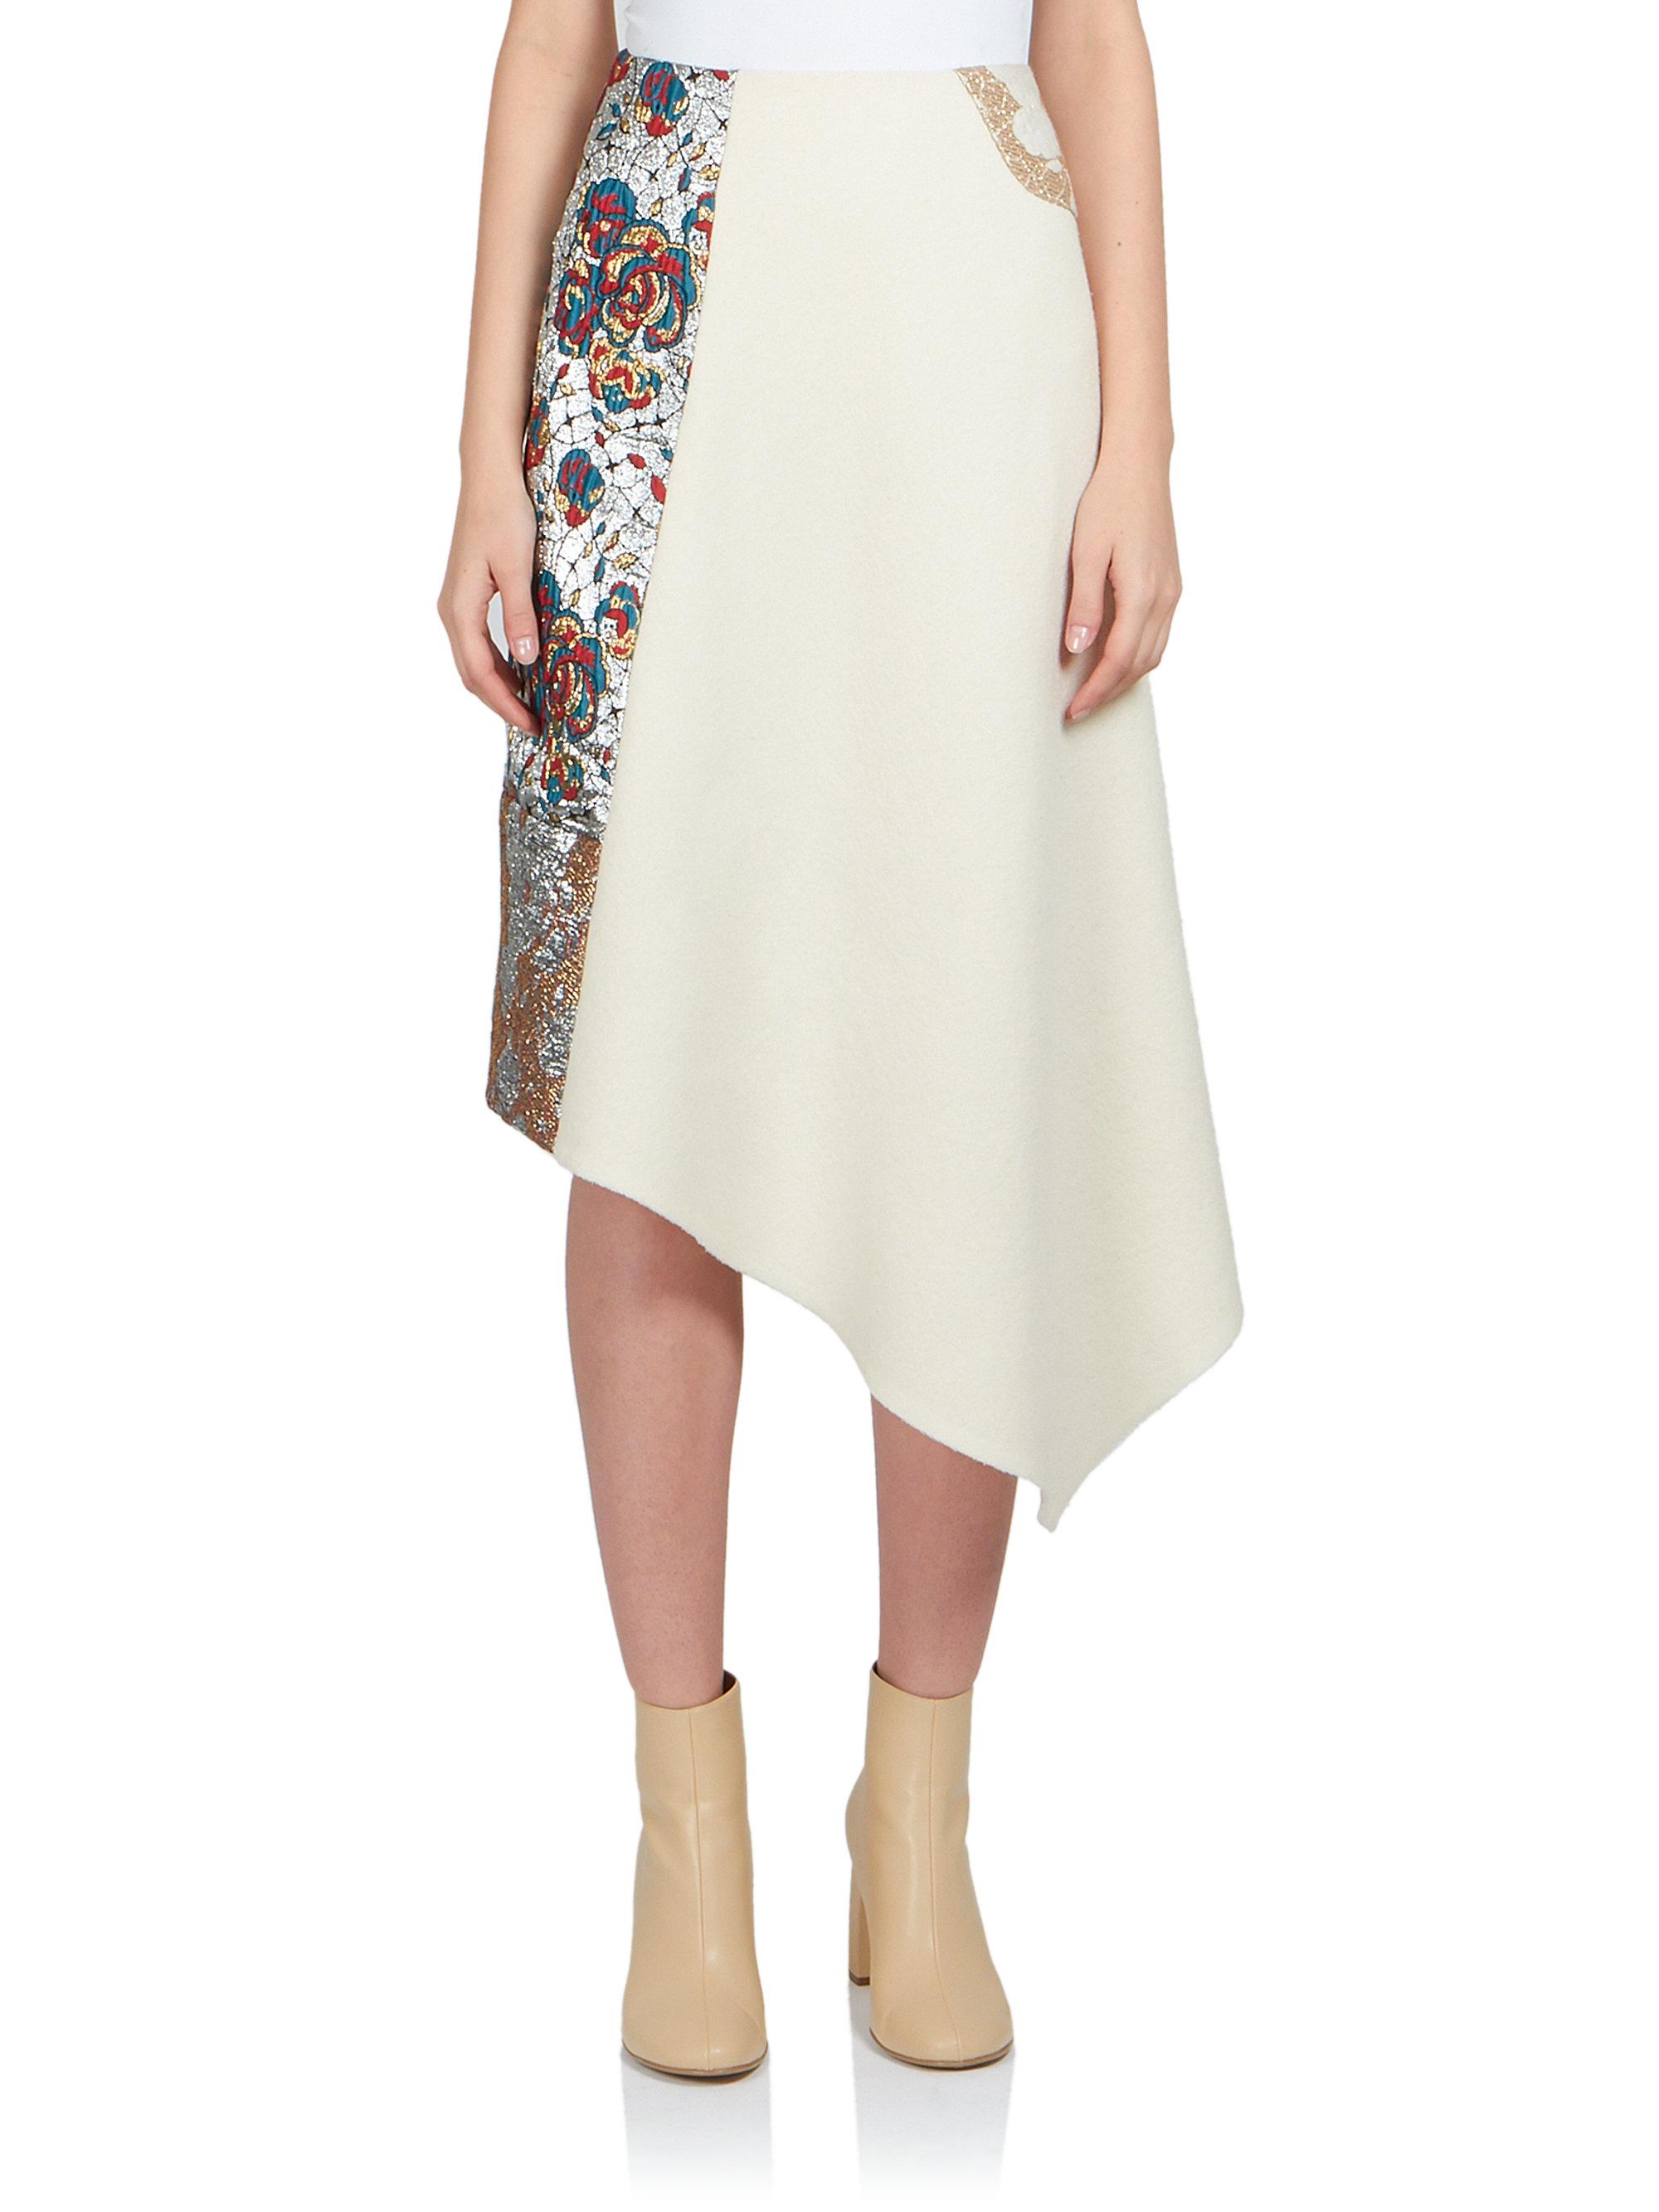 4b7e19c0858c Go glam like Amne in a midi length skirt by Stella McCartney